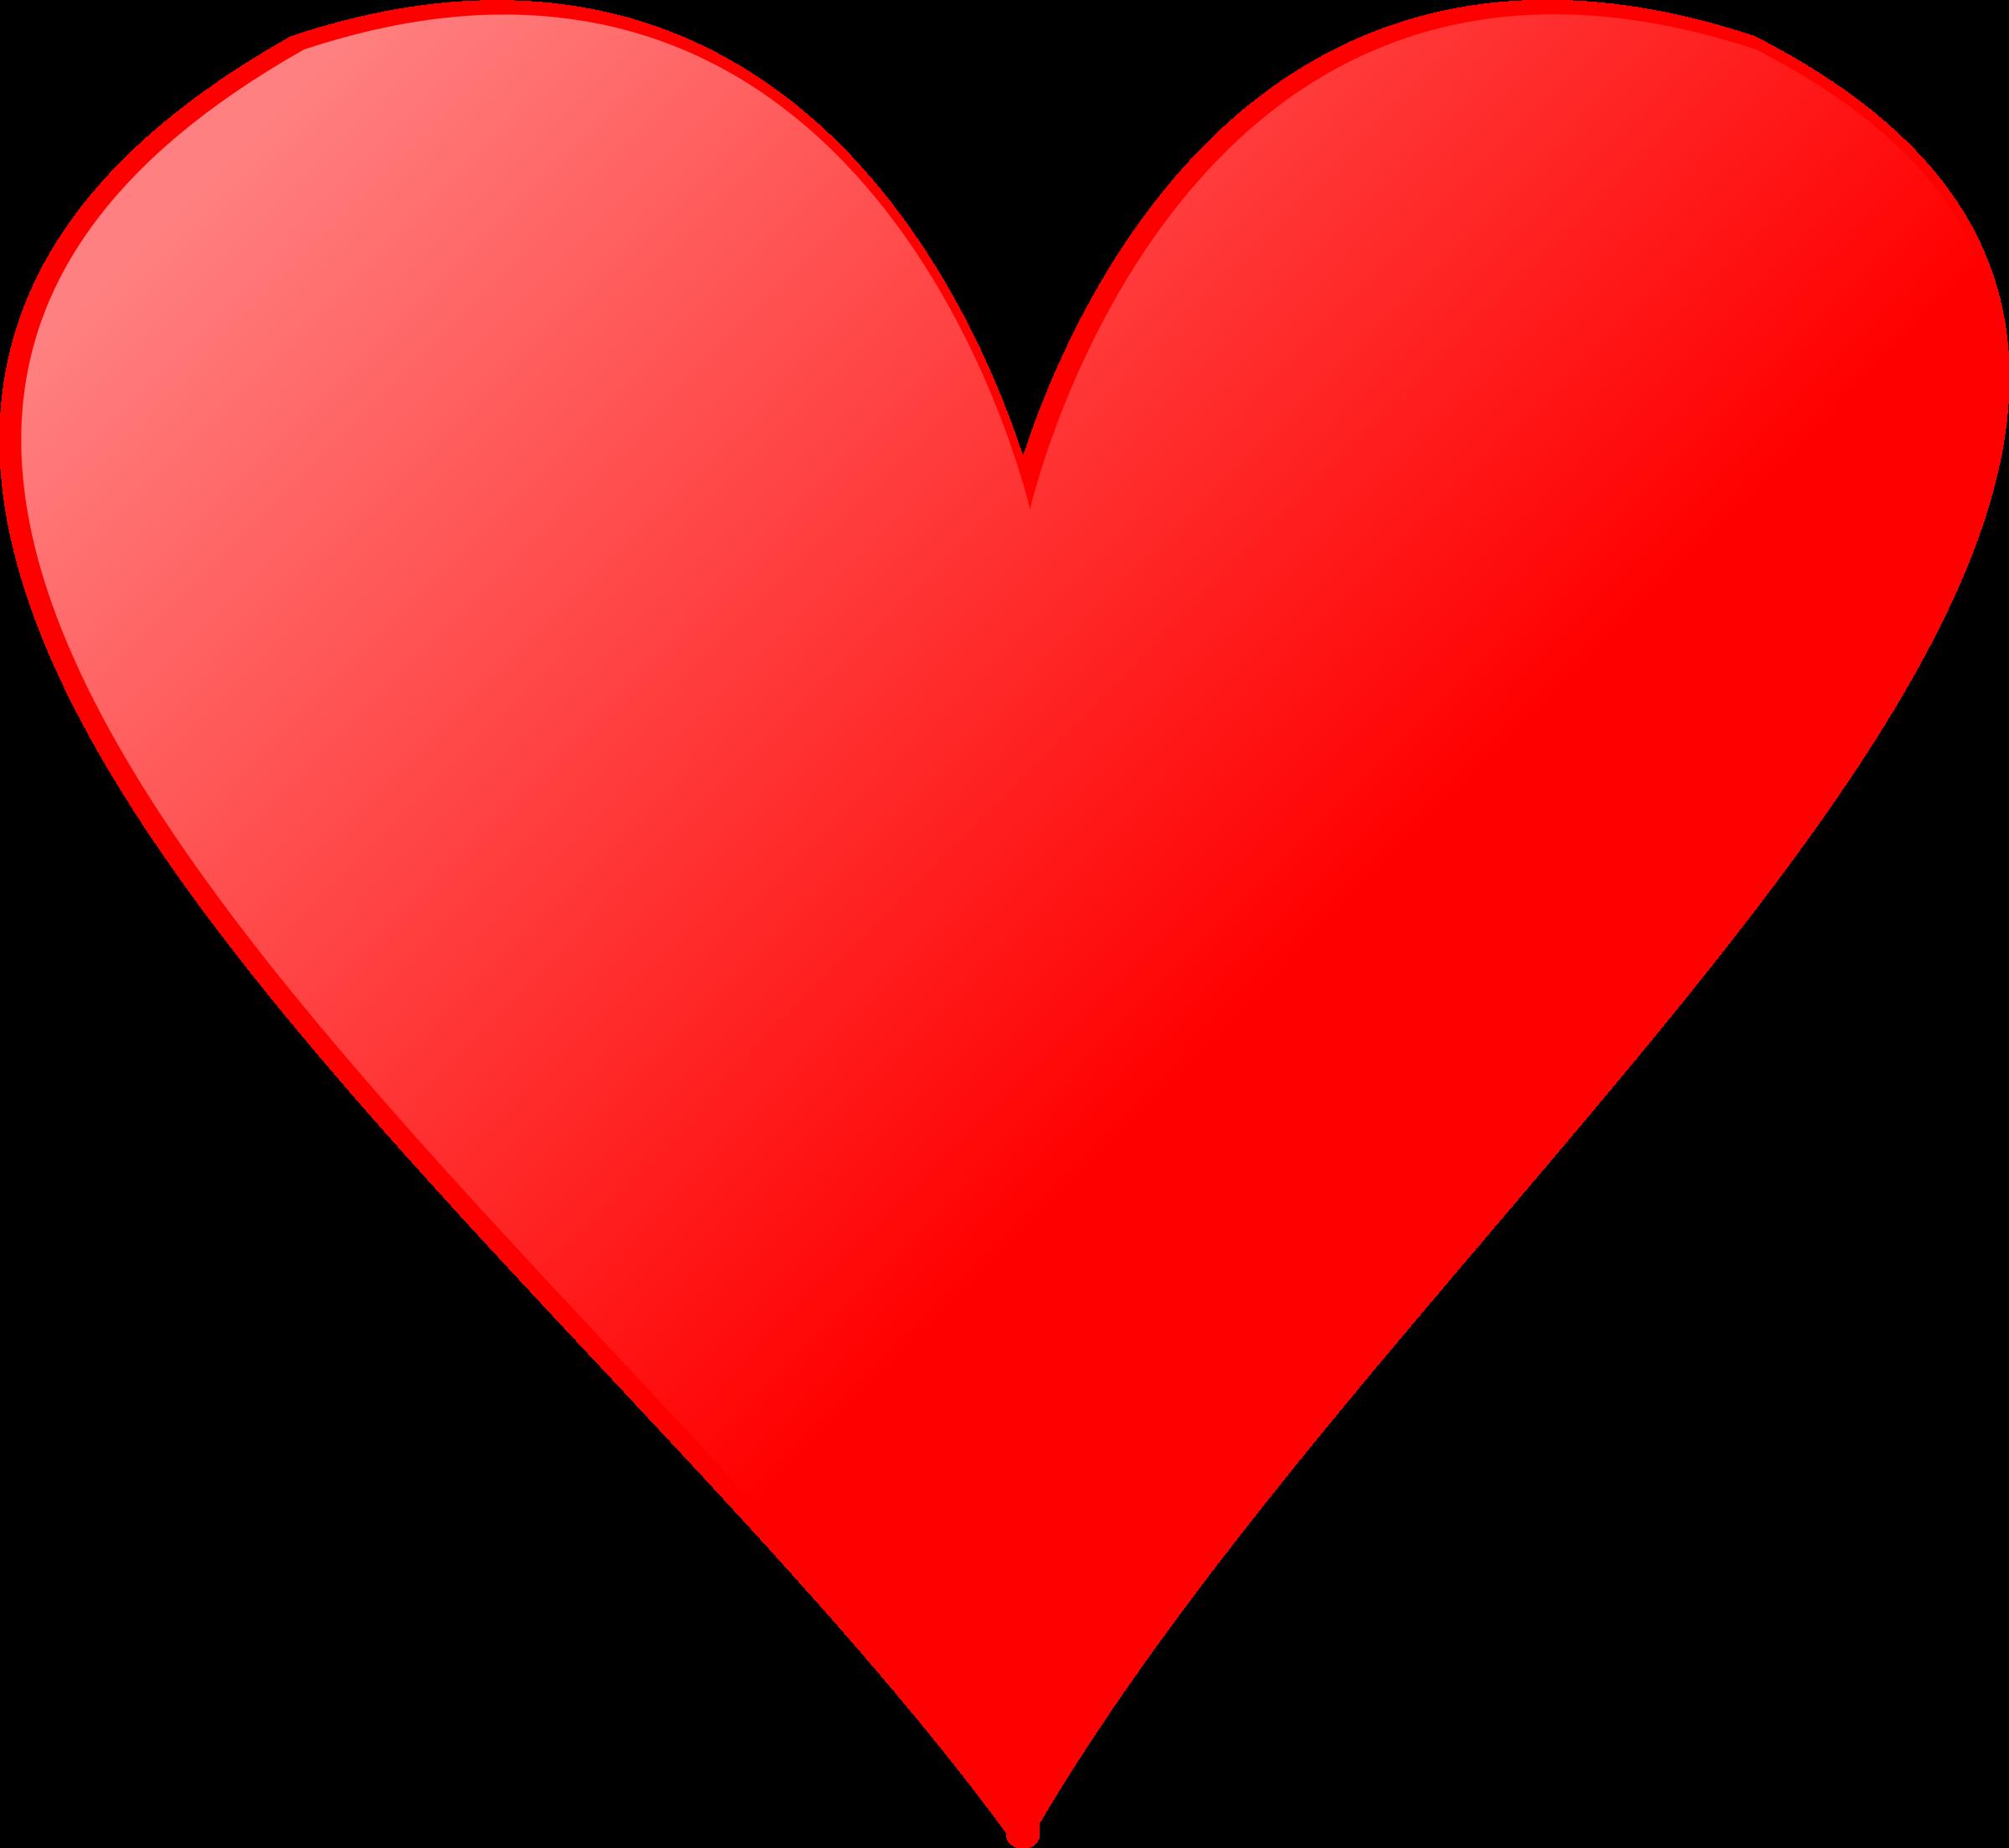 Card clipart valentine's day Card Heart Card symbols: symbols: